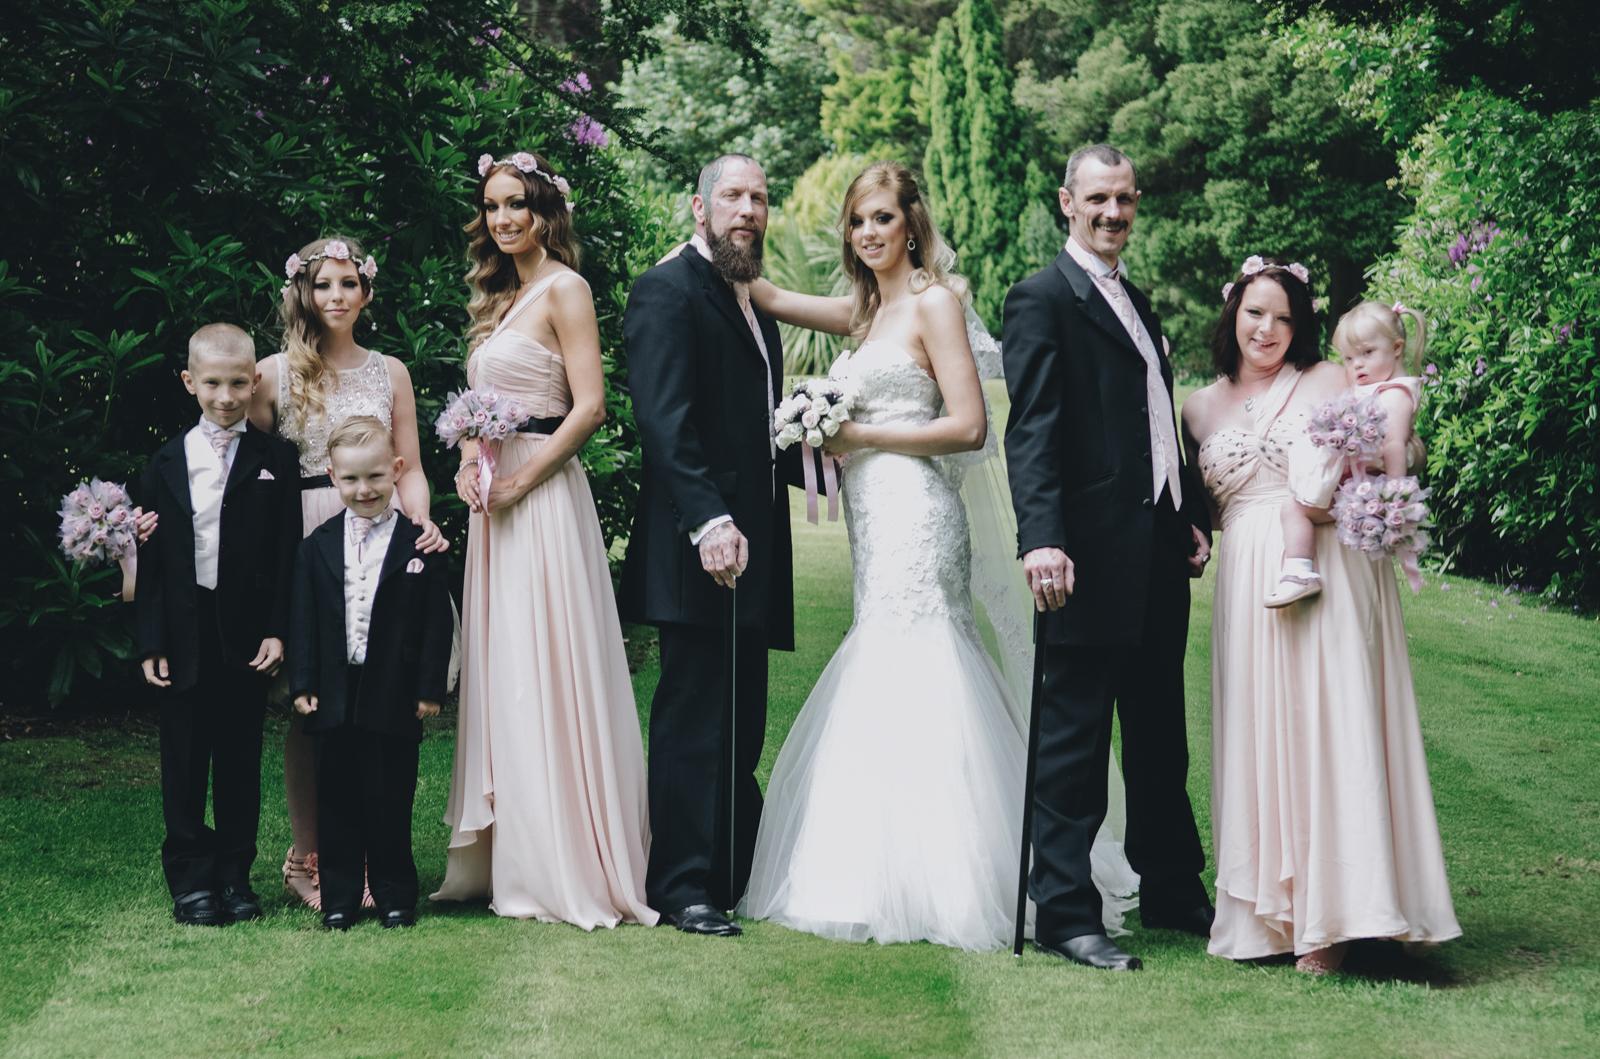 Alternative-North-West-Manchester-Wedding-Photography-Astley-bank-Wedding-skull-cake-tattooed-groom-29.jpg